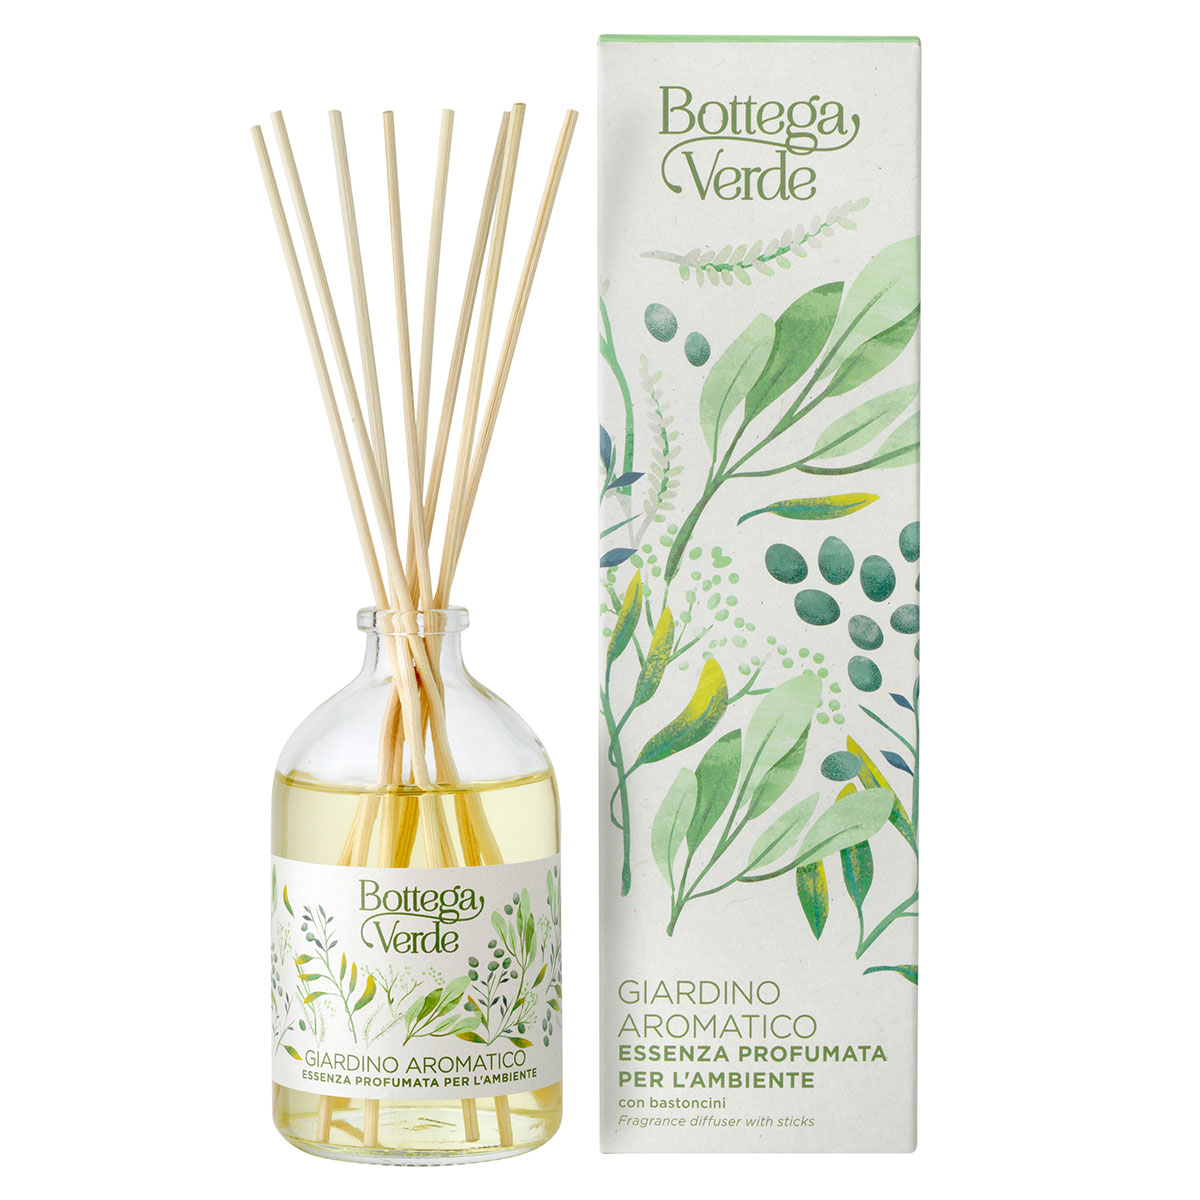 Difuzor de parfum cu aroma de flori exotice - Giardino Aromatico, 100 ML